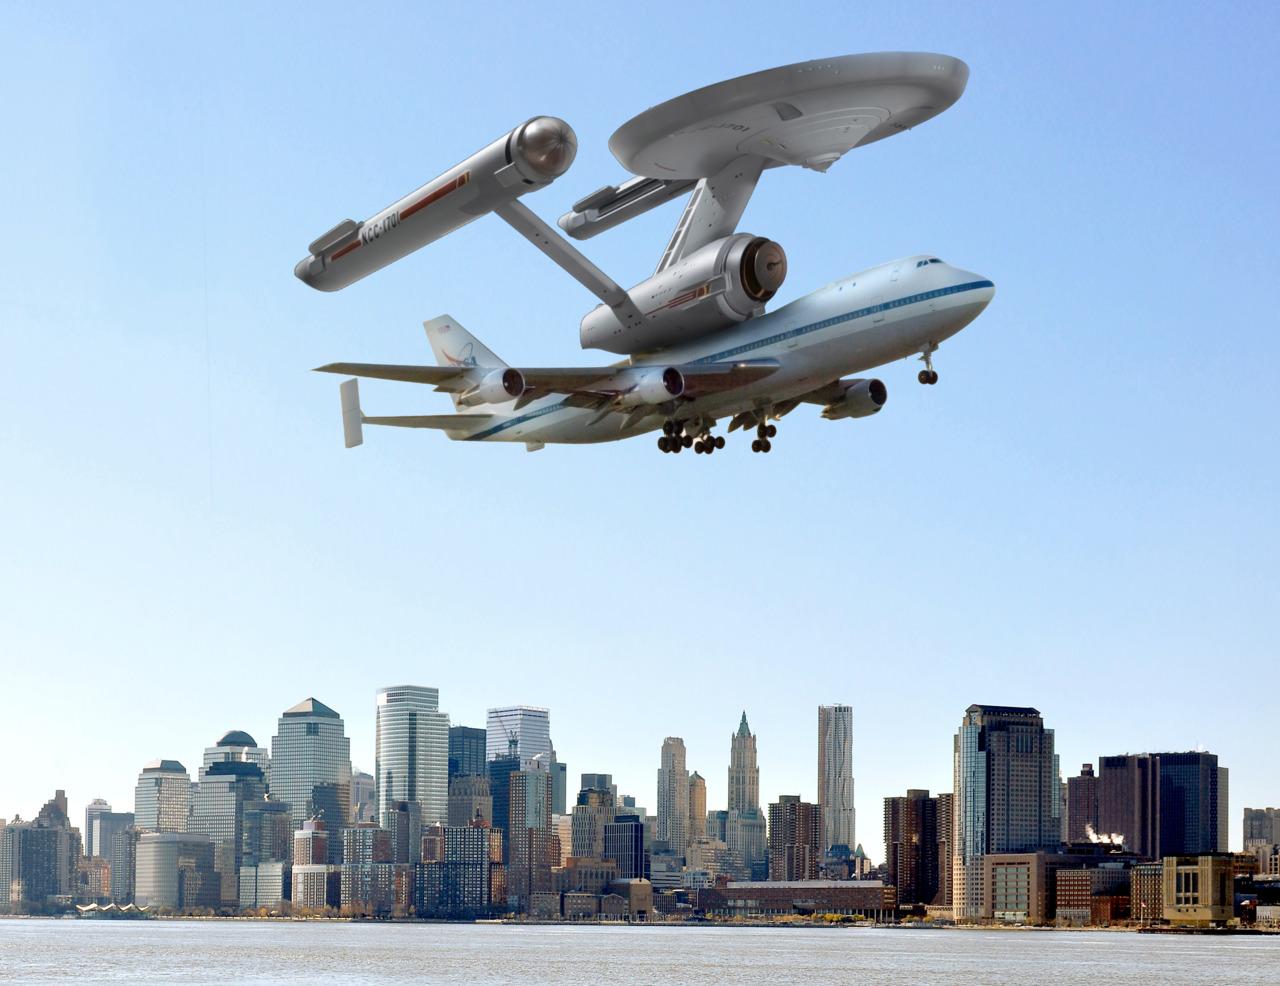 space shuttle enterprise - HD1280×986